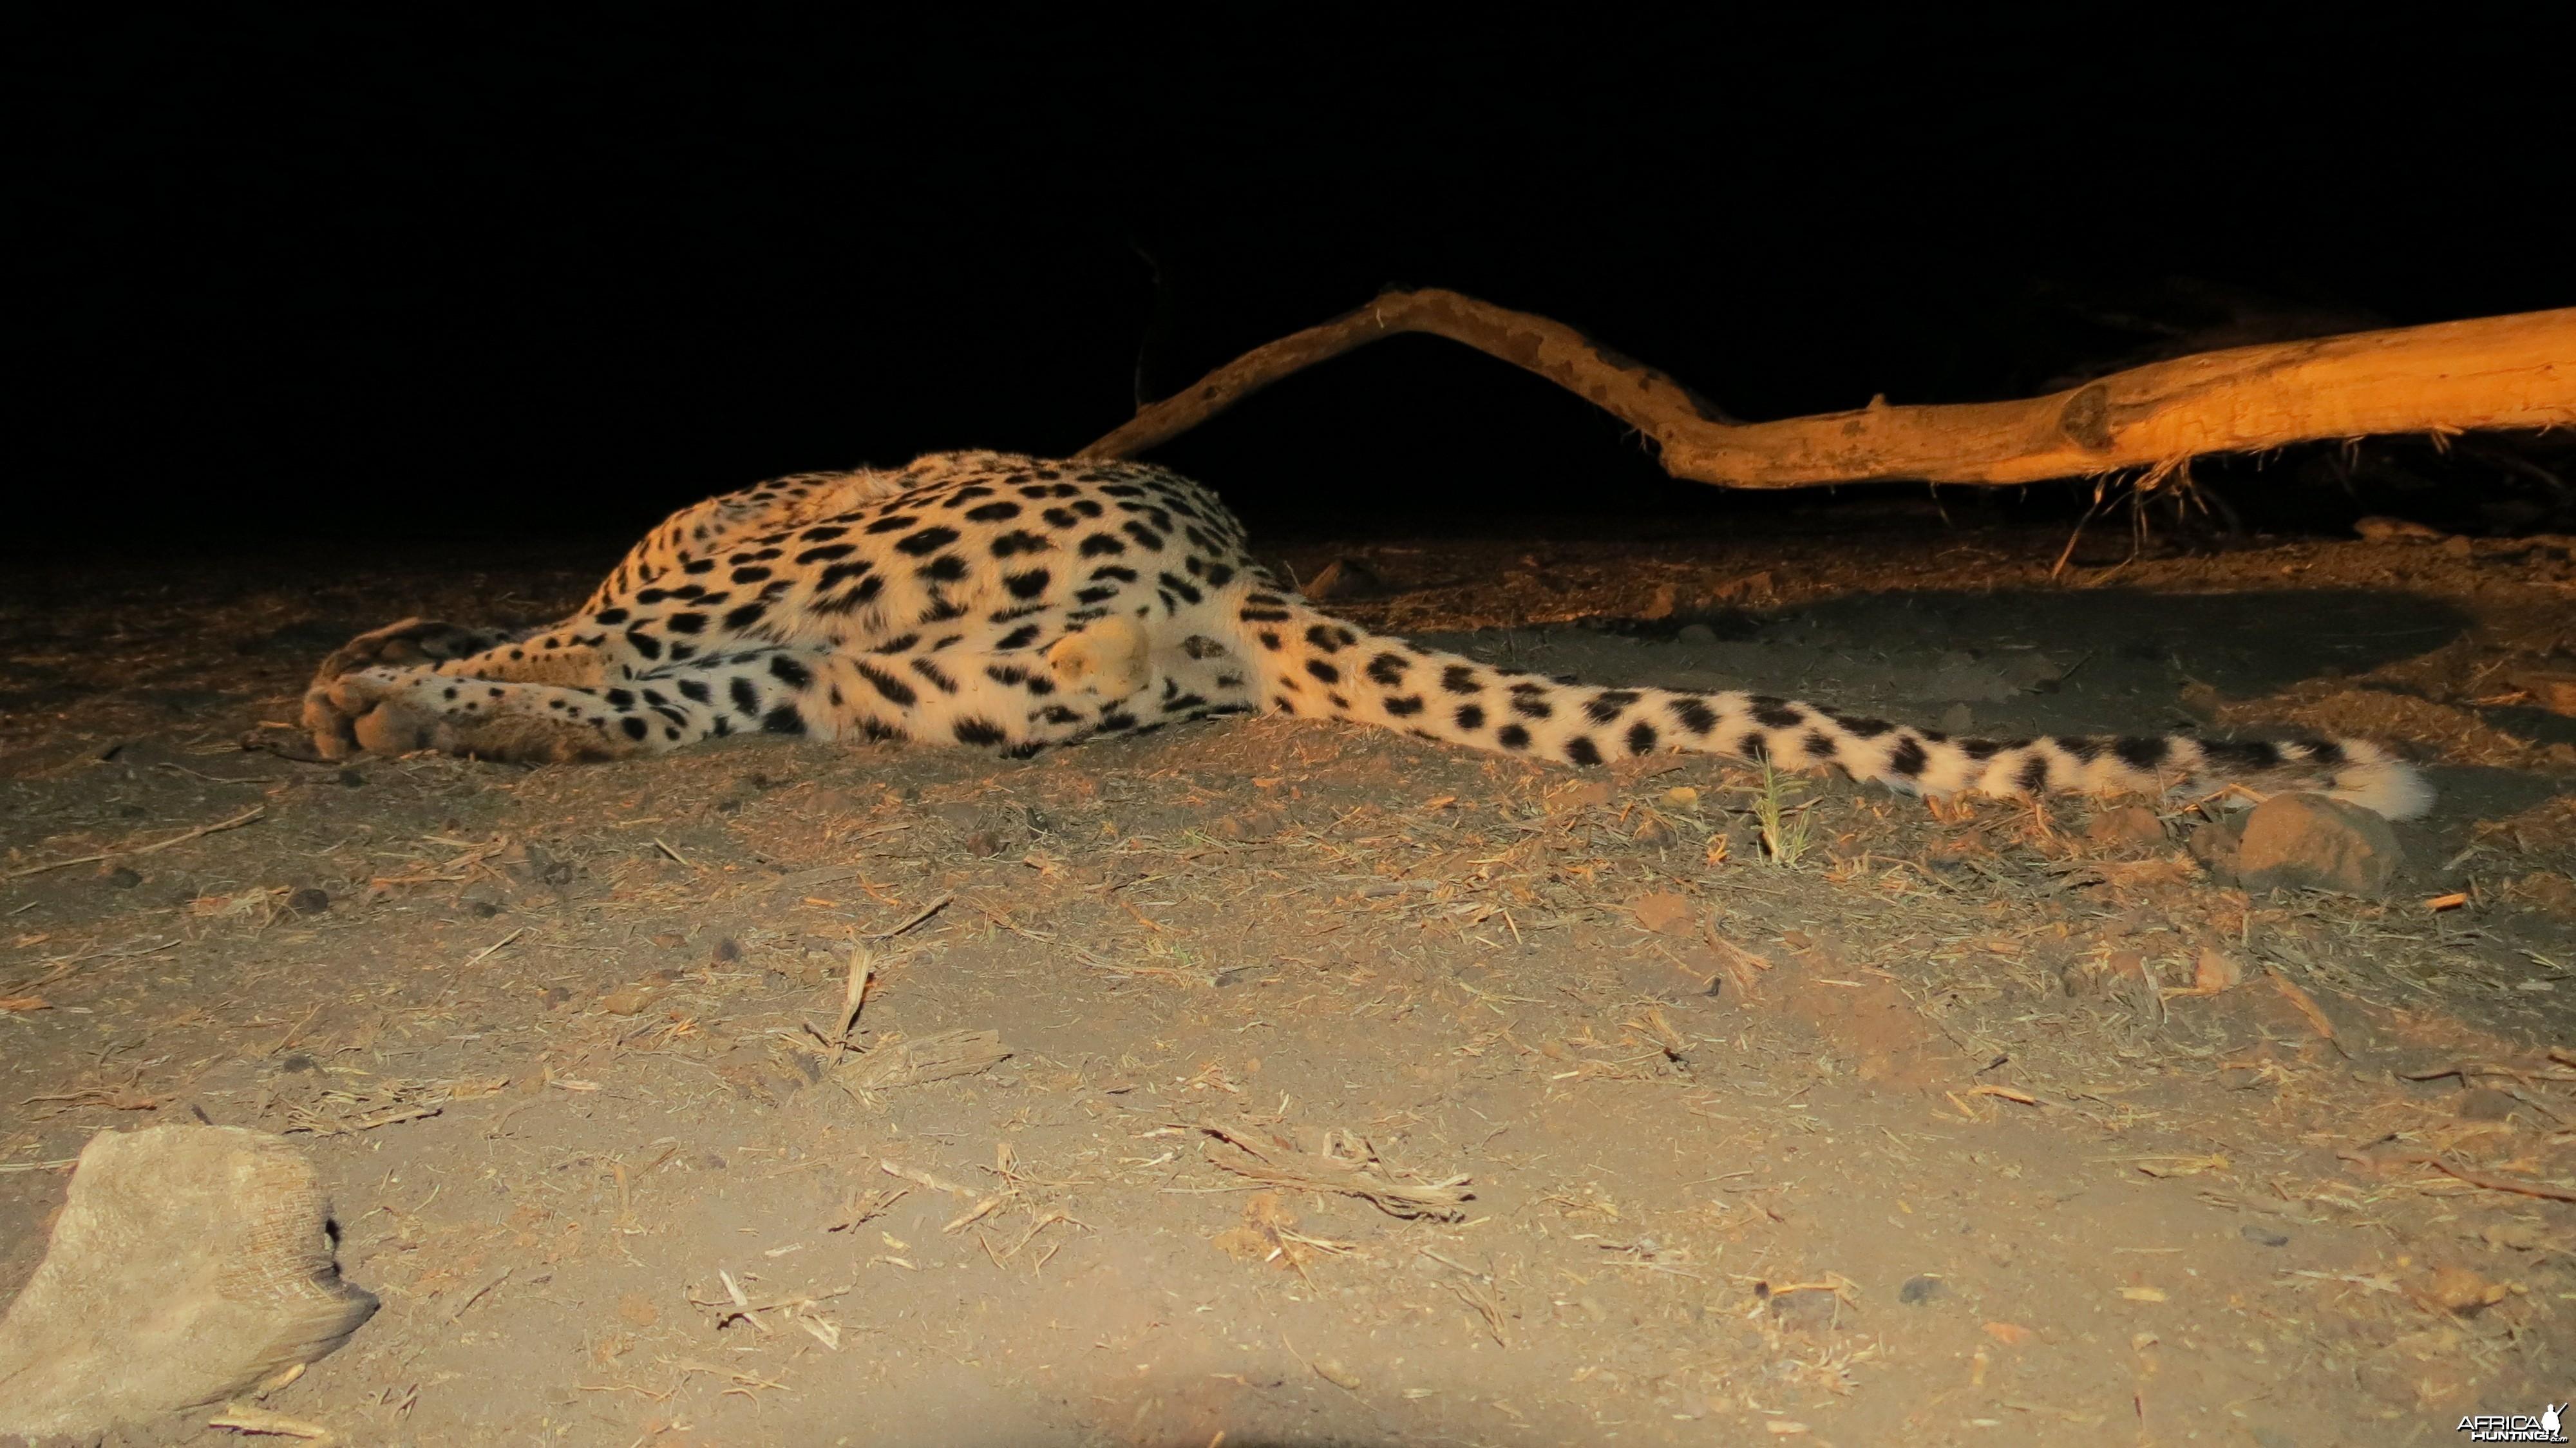 Male Leopard Genitals